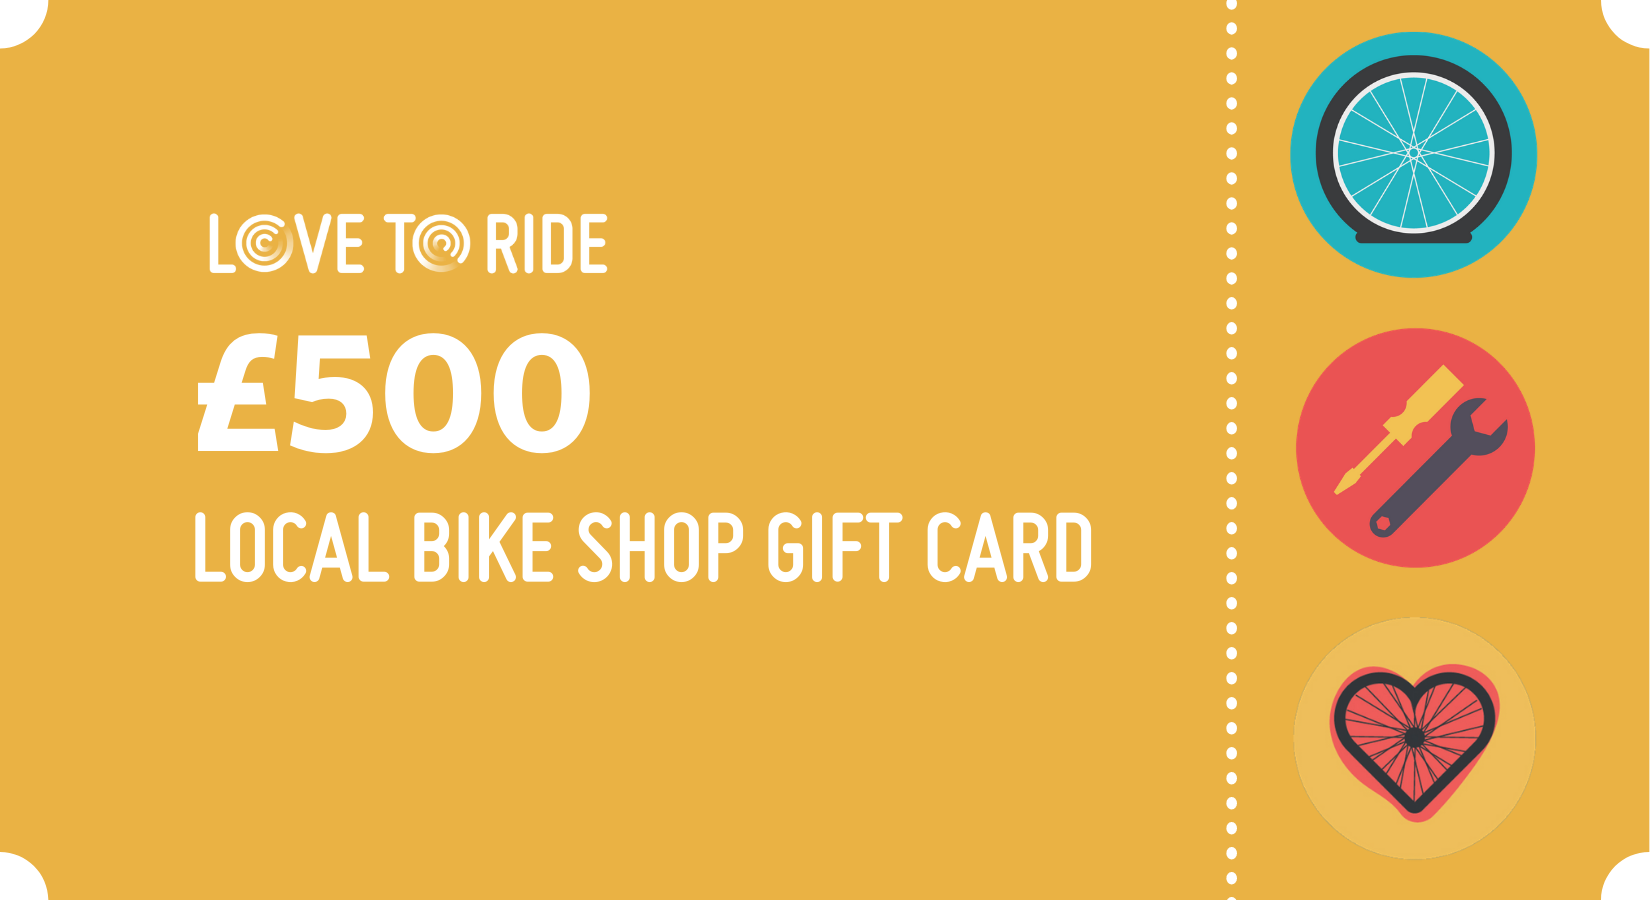 Love to Ride £500 local bike shop gift card